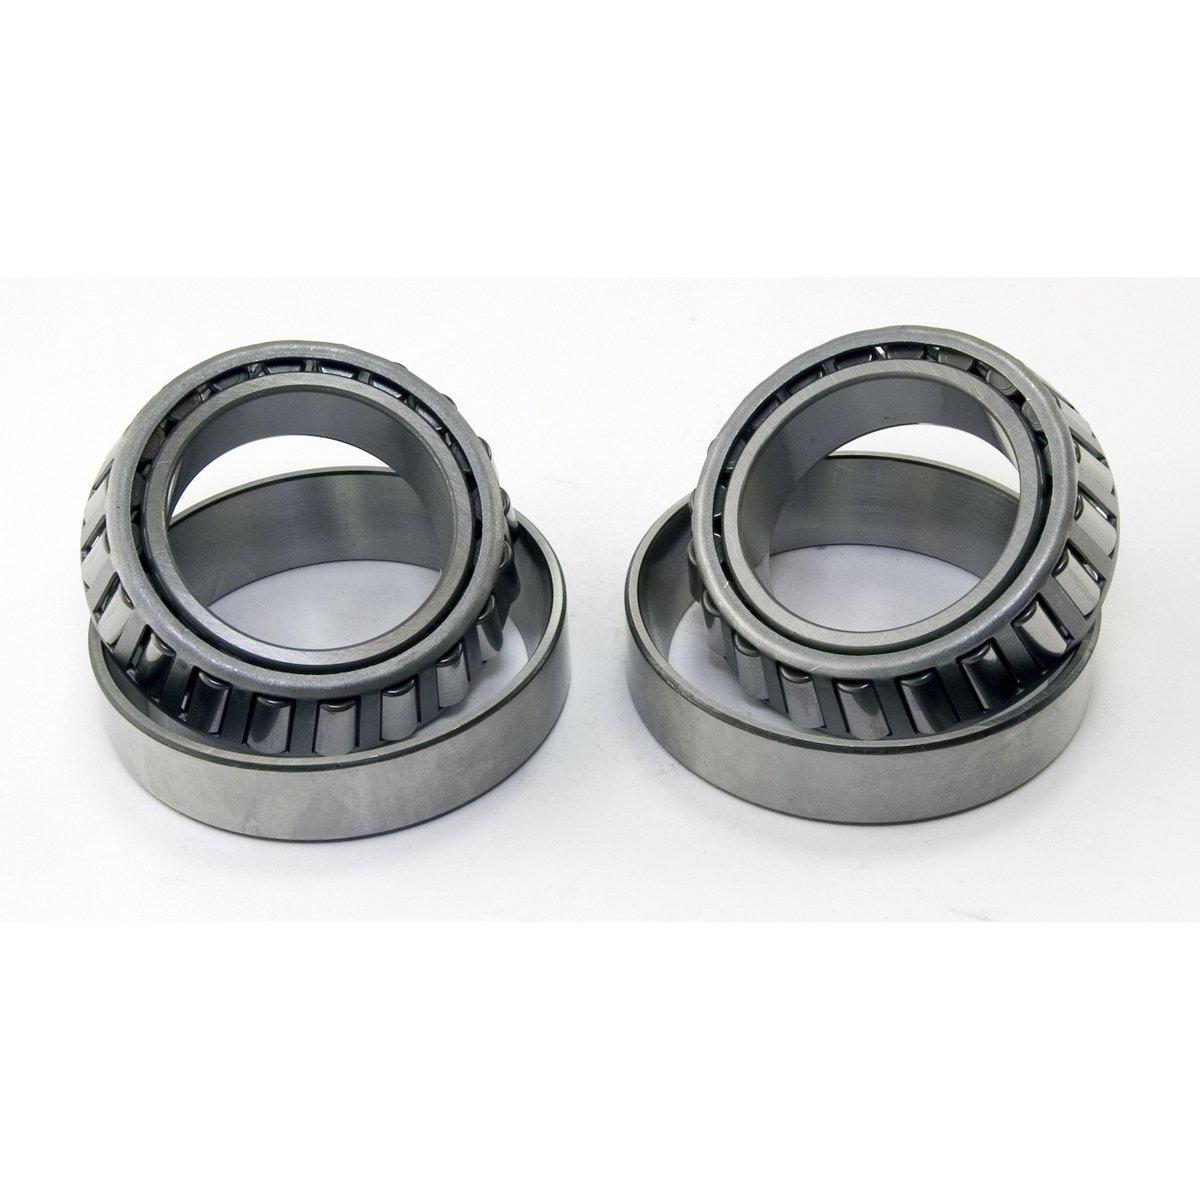 Omix-Ada 16560.48 Bearing Kit